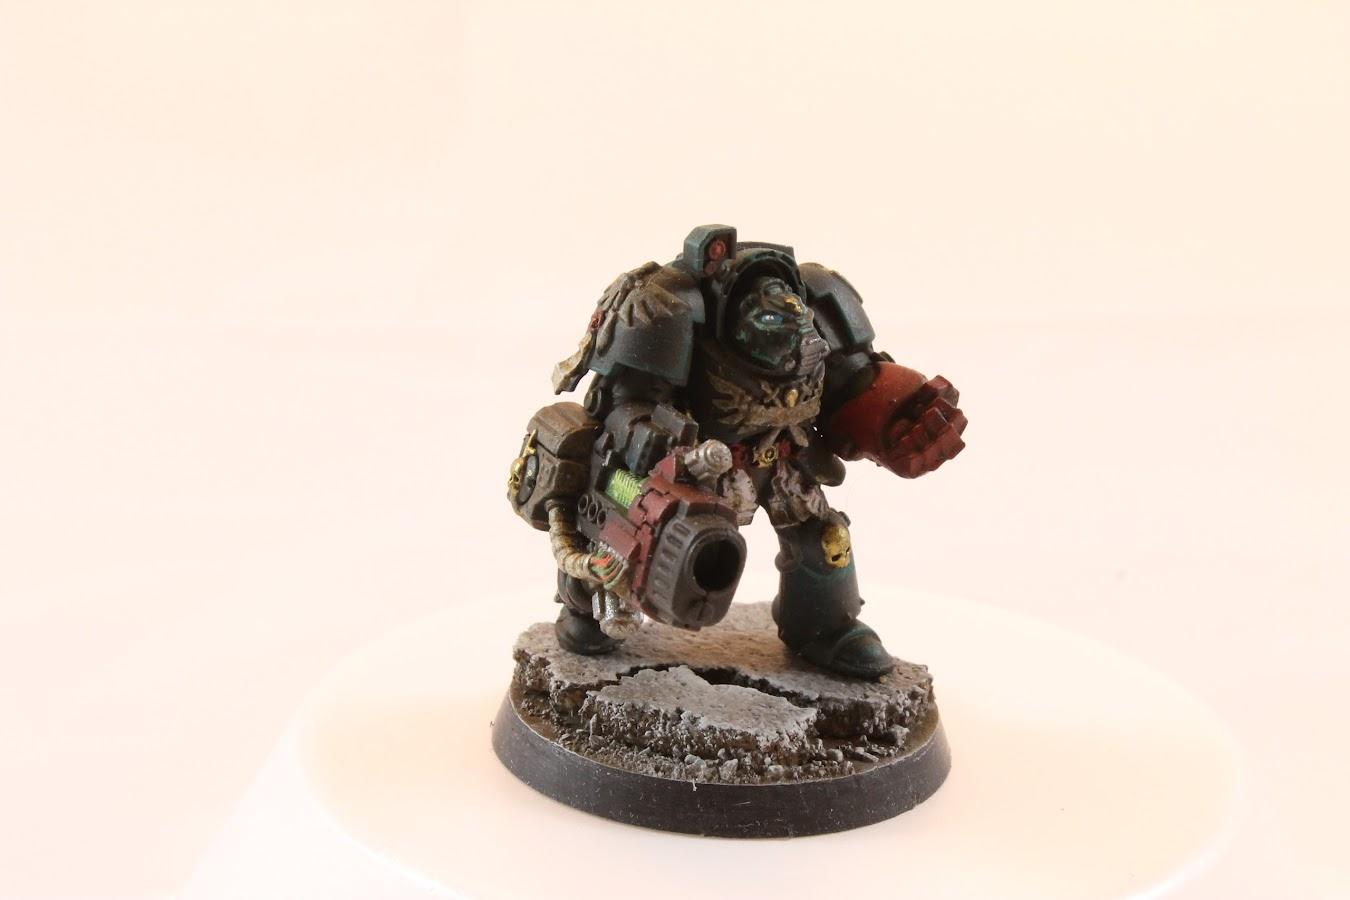 Terminator #4, painted, reverse angle